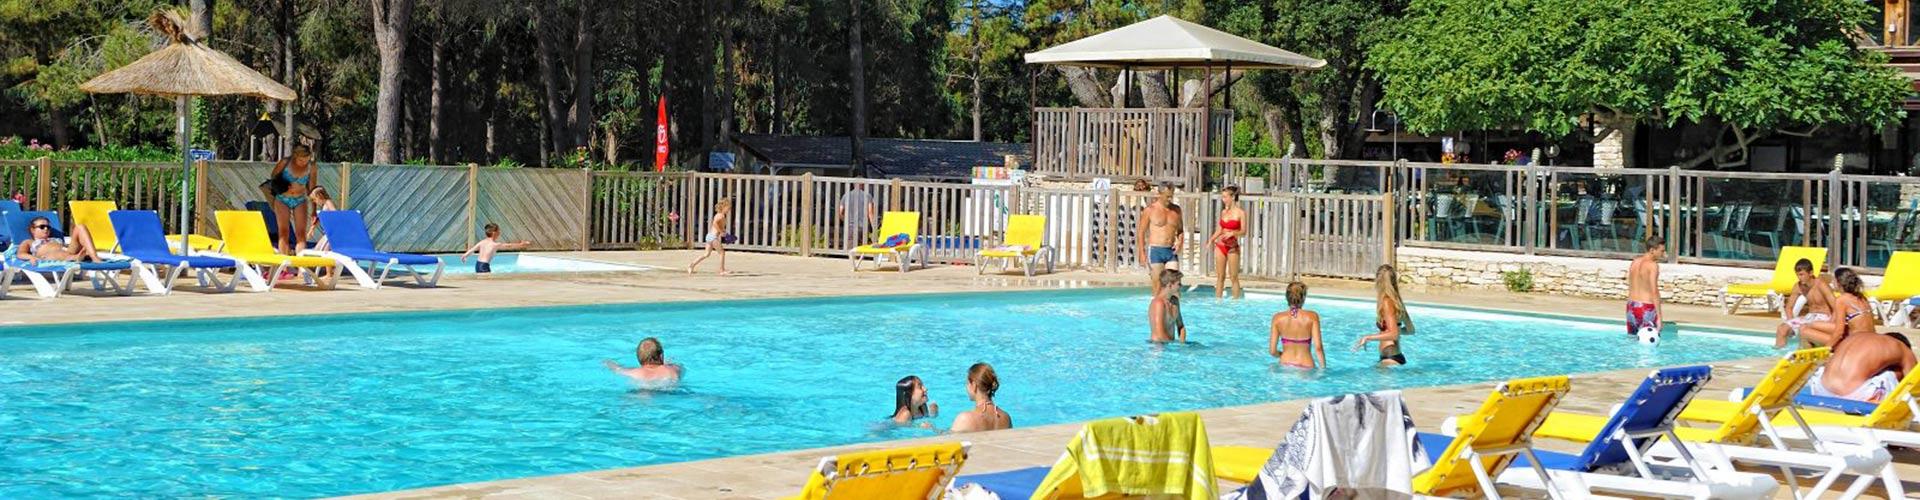 Camping le campo di liccia bonifacio en corse du sud - Camping bonifacio piscine ...